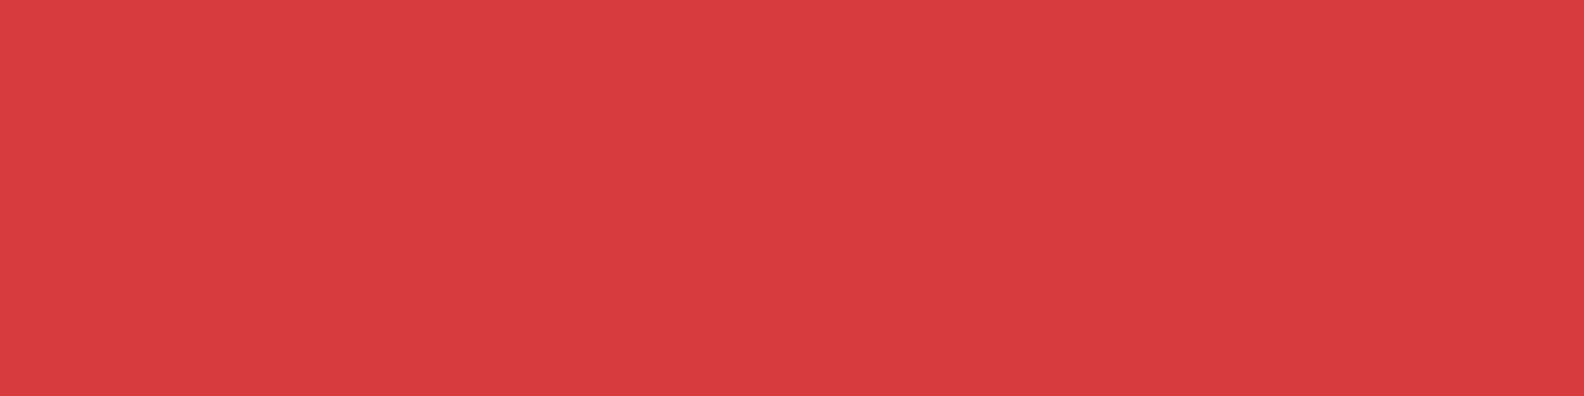 1584x396 Jasper Solid Color Background